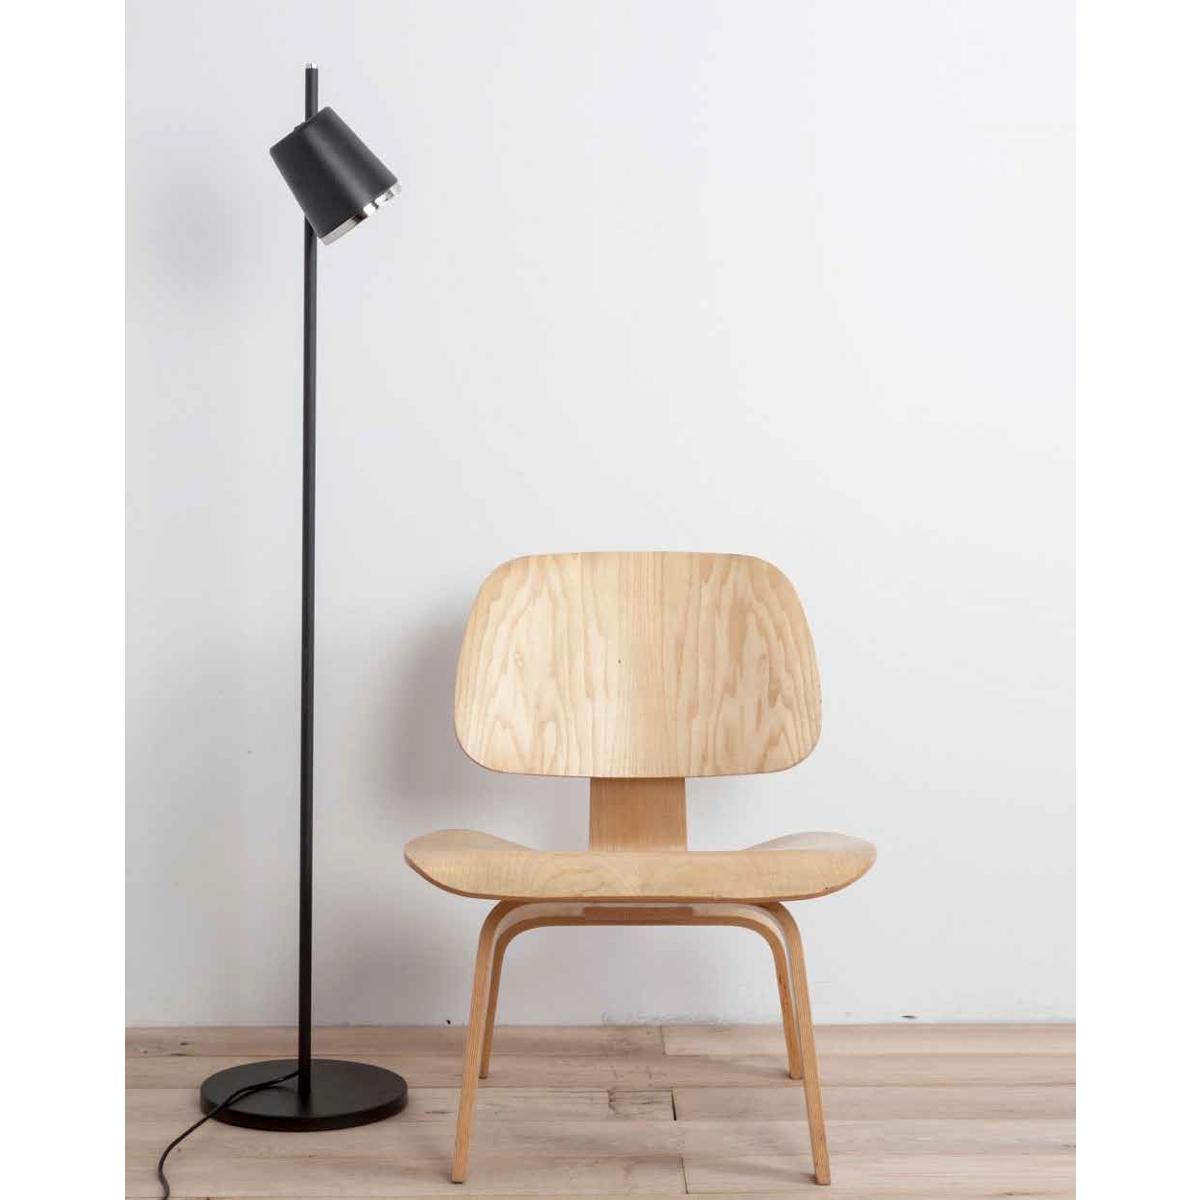 wundersch ne design wandleuchte im retro stil der 70er jahre. Black Bedroom Furniture Sets. Home Design Ideas